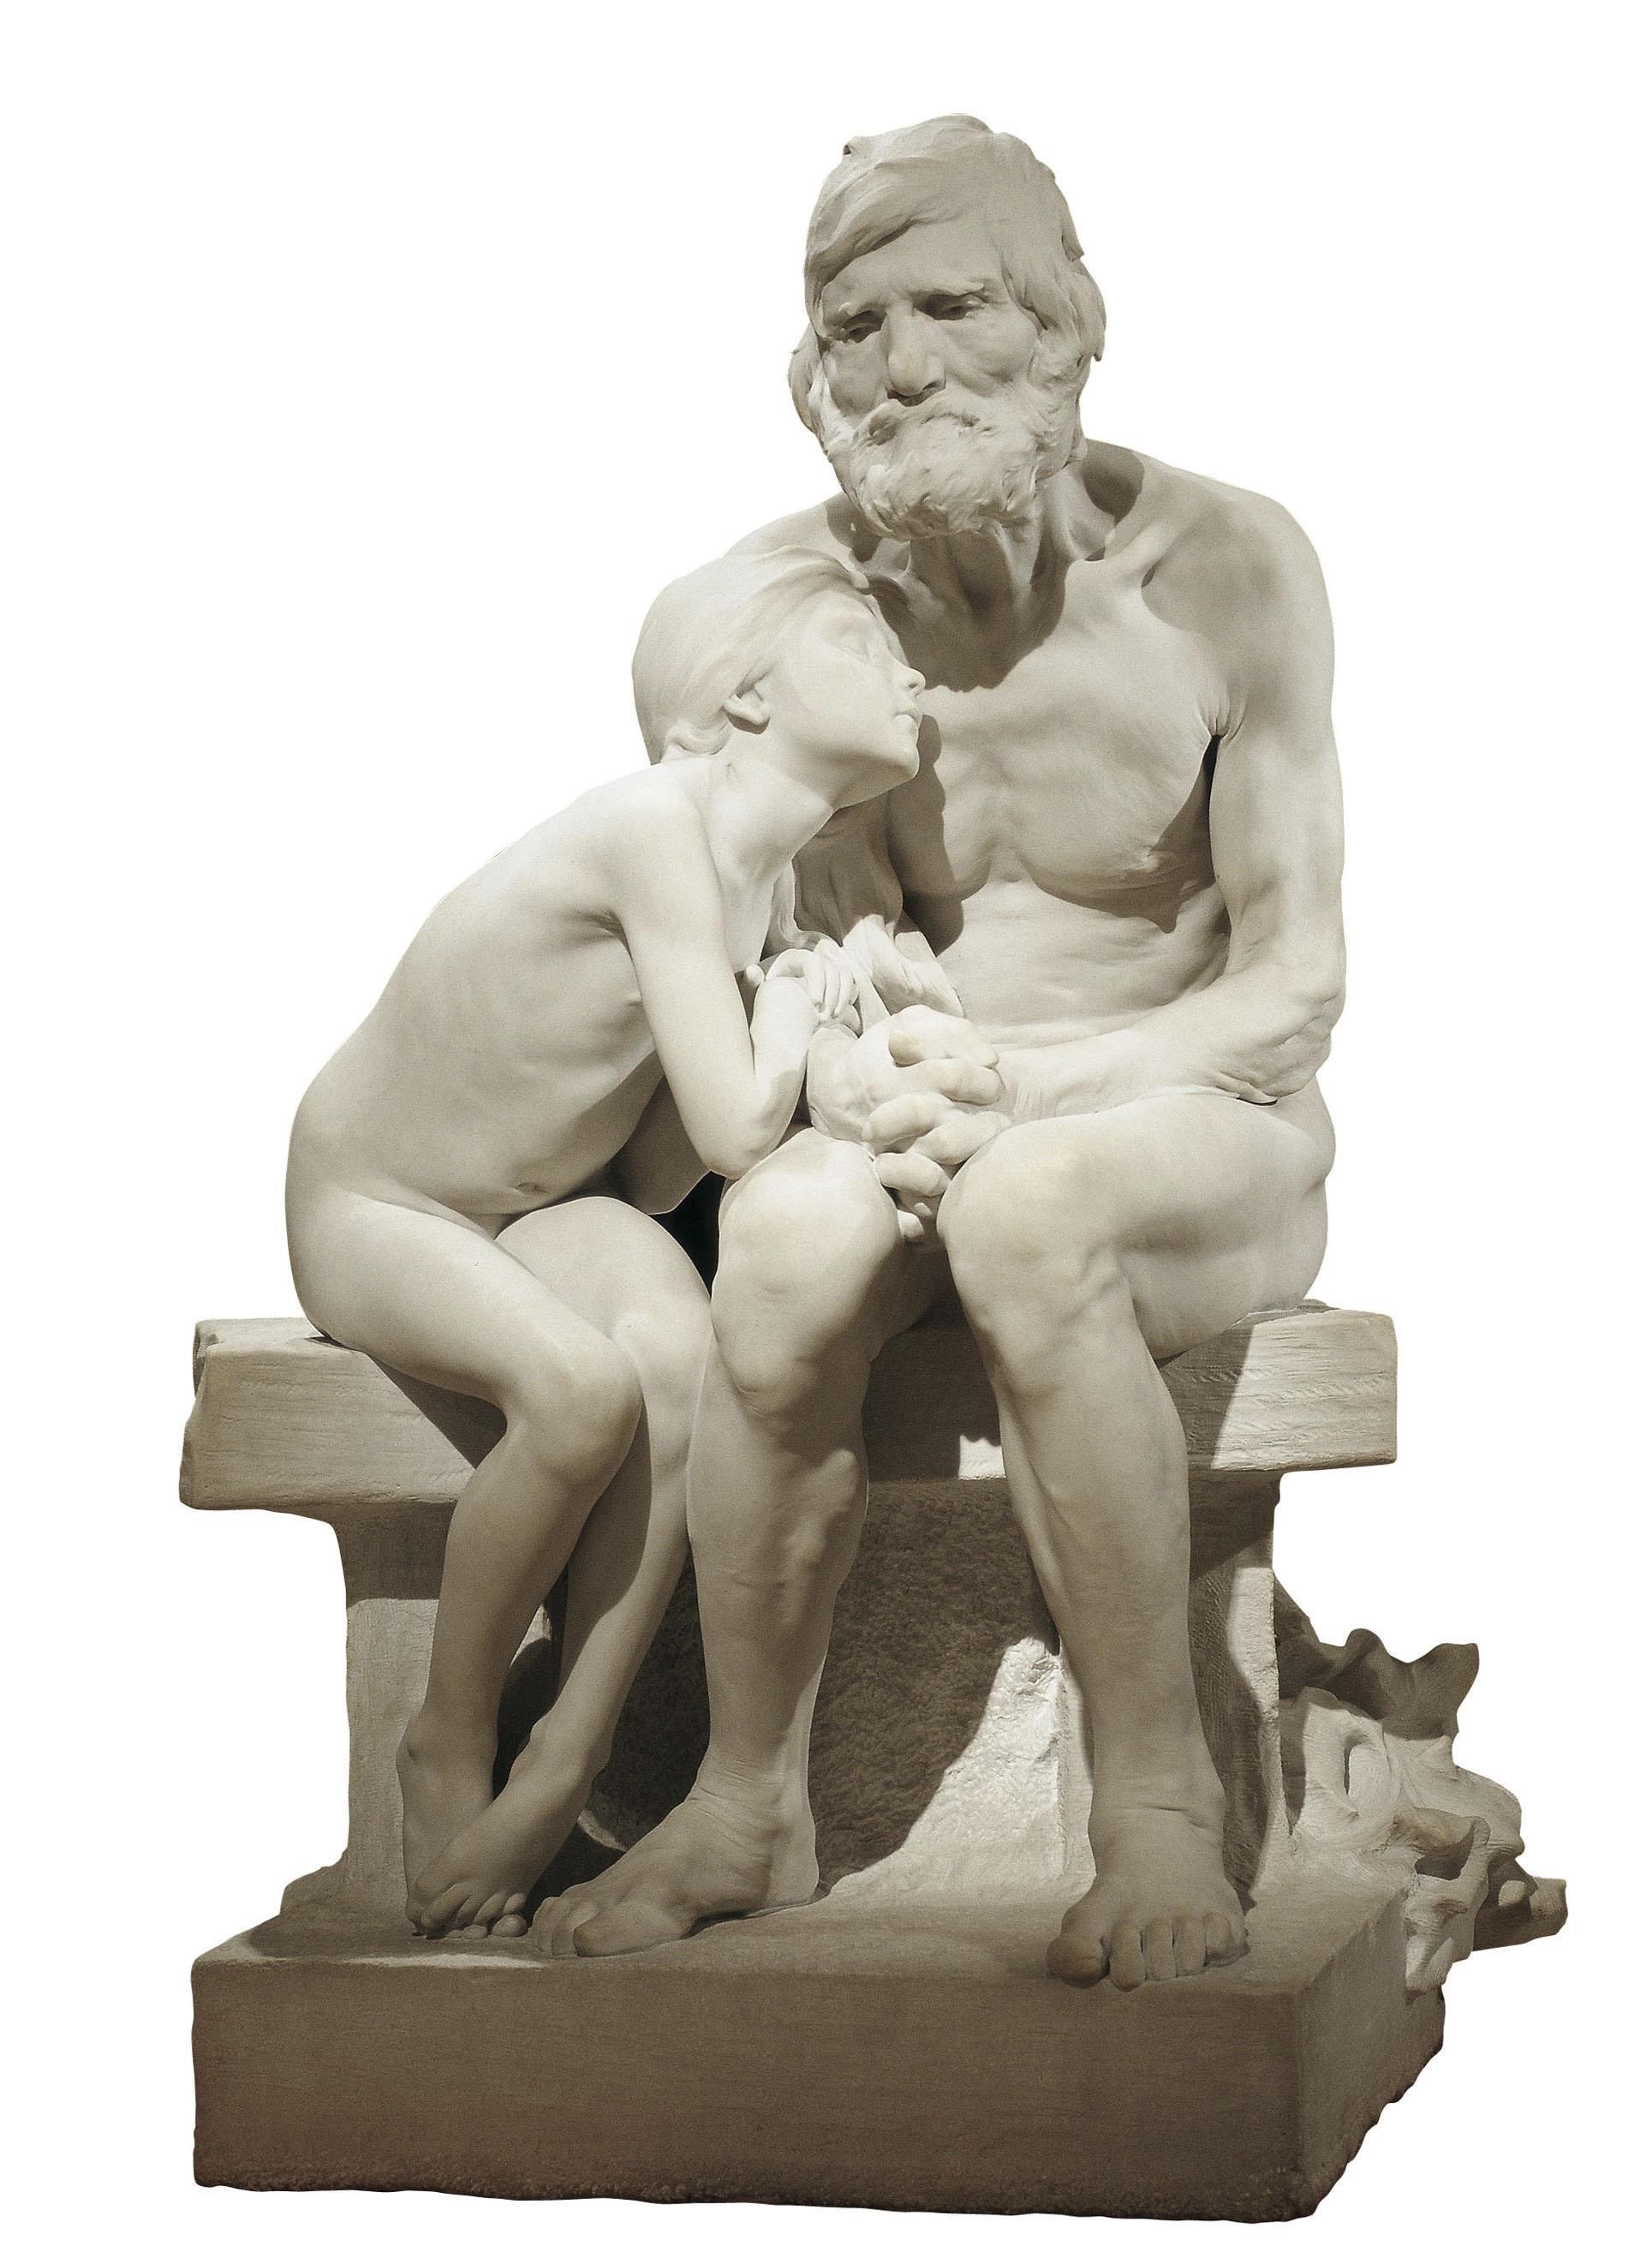 Miquel Blay, Els primers freds, 1892